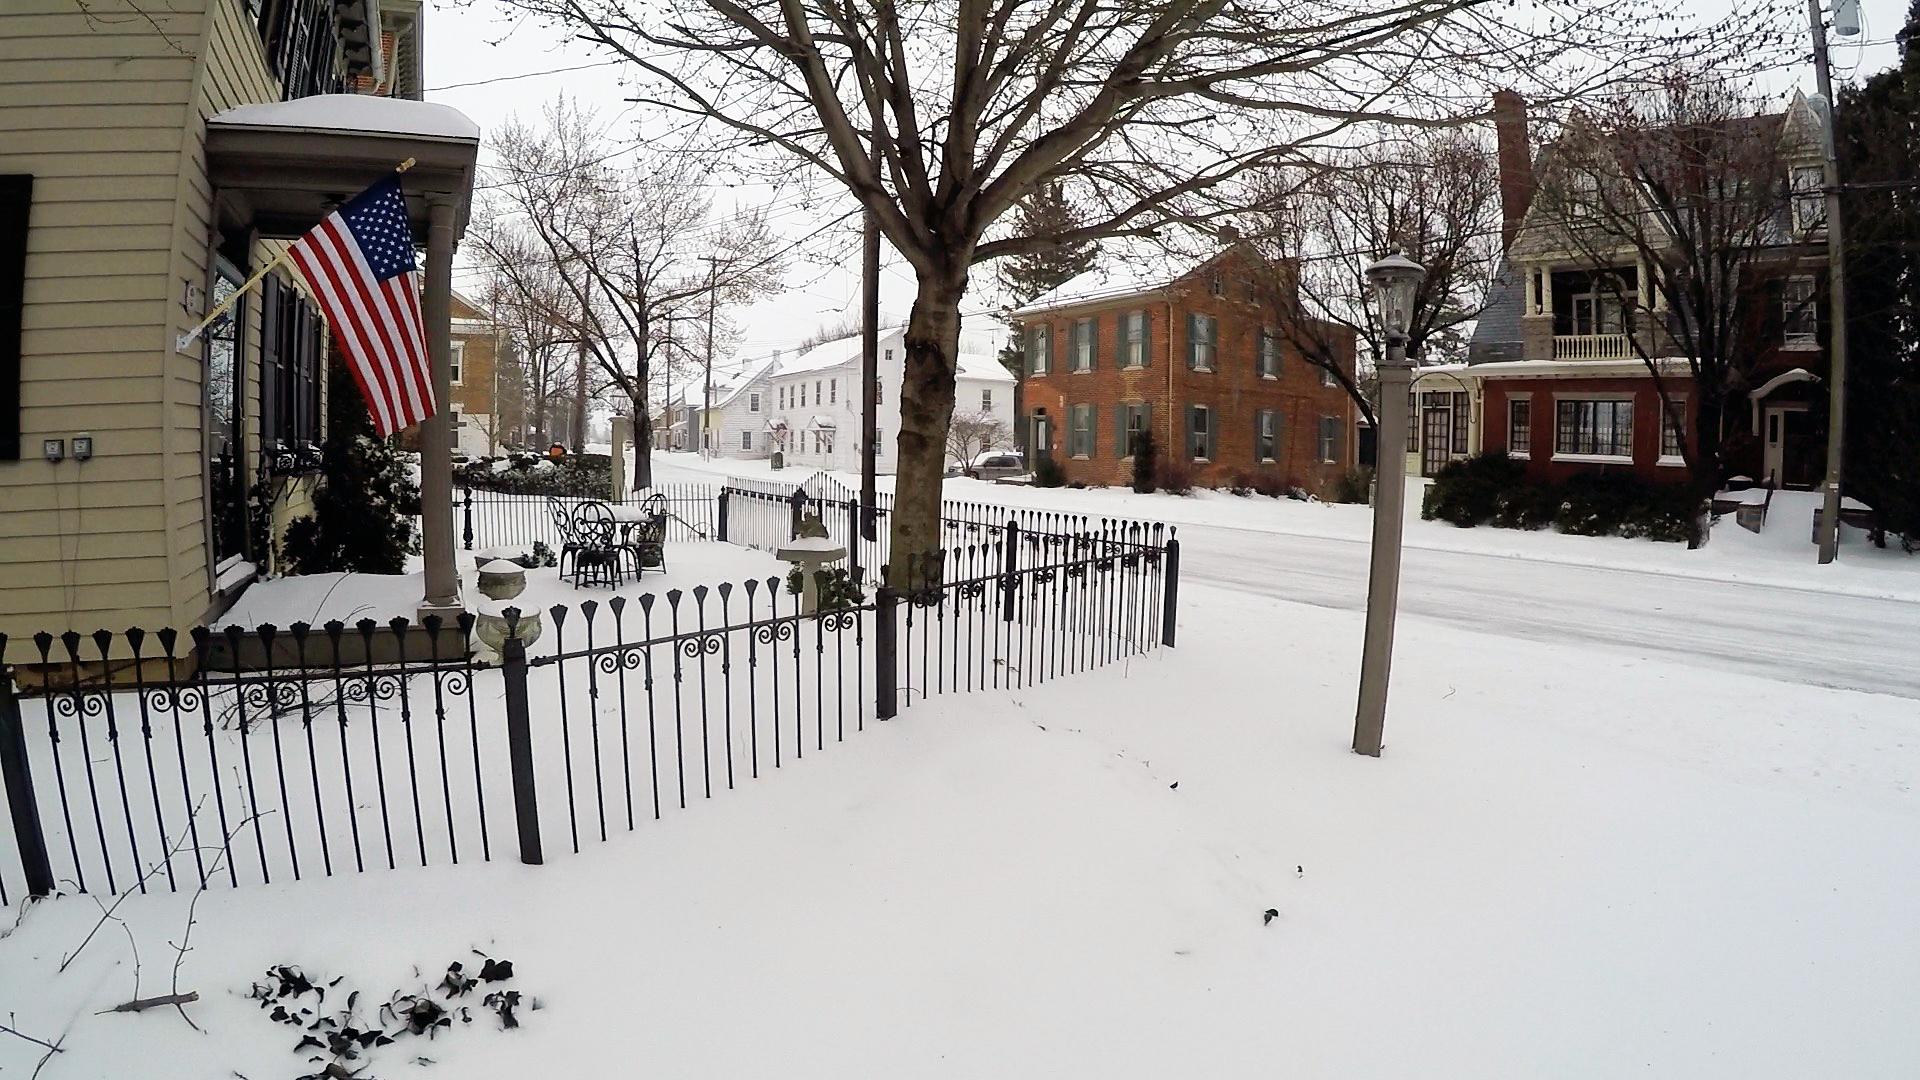 Snow in Pennsylvania